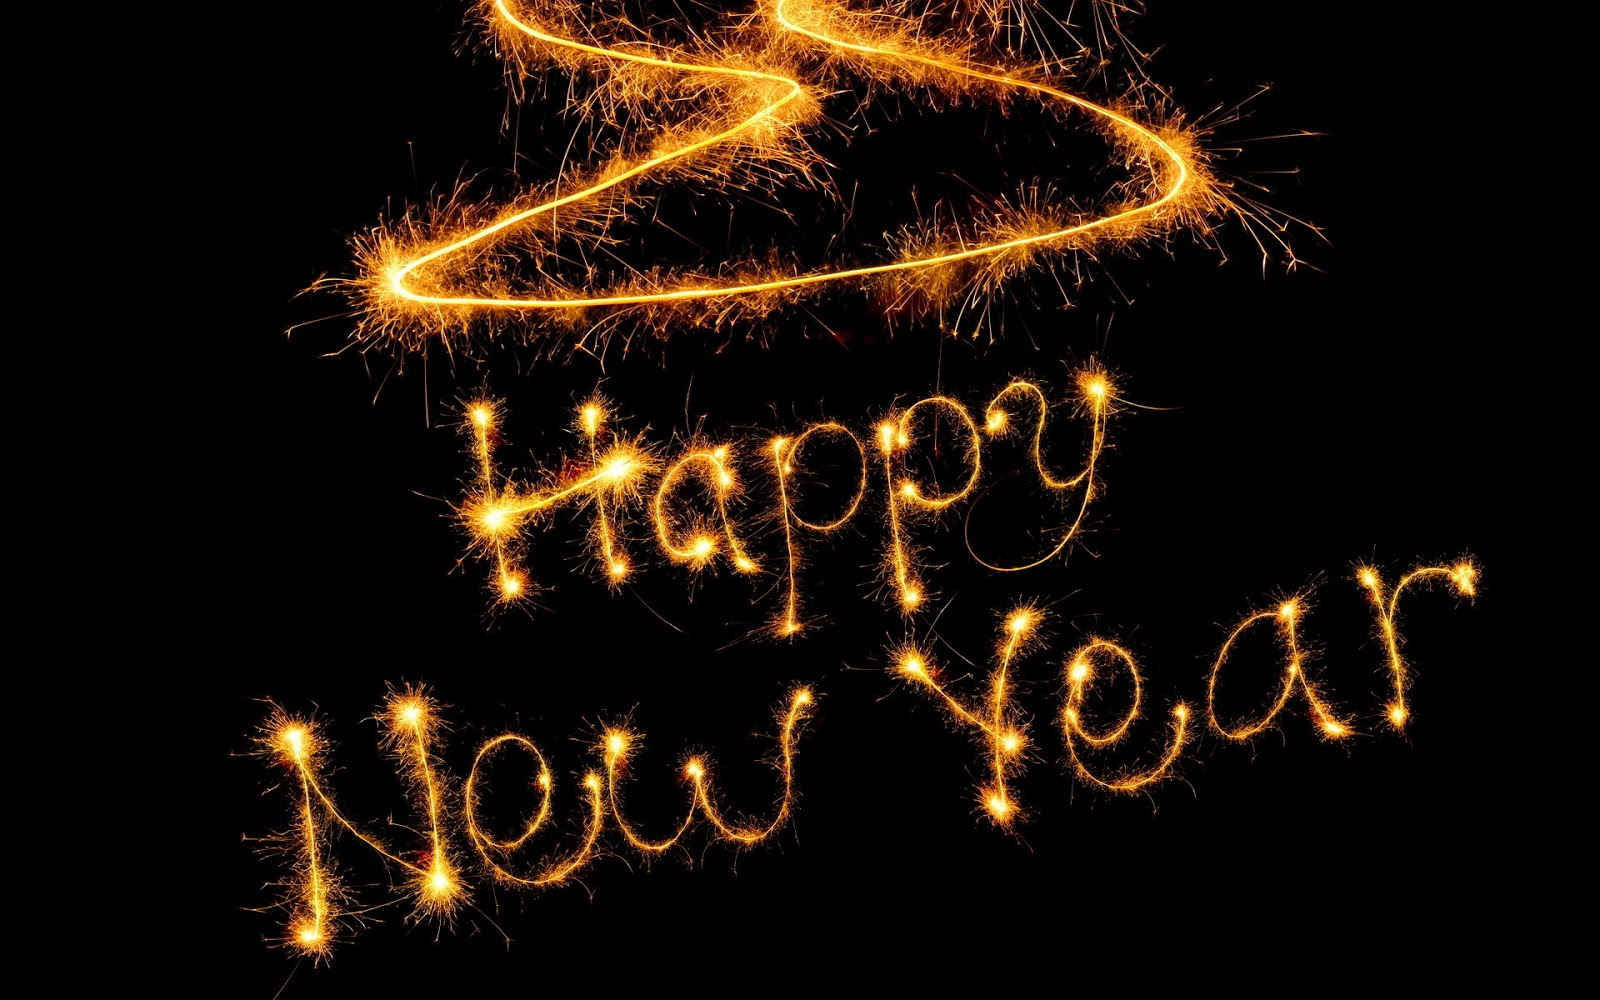 HD Wallpaper Download Happy New Year 2013 HD Wallpaper 1600x1000